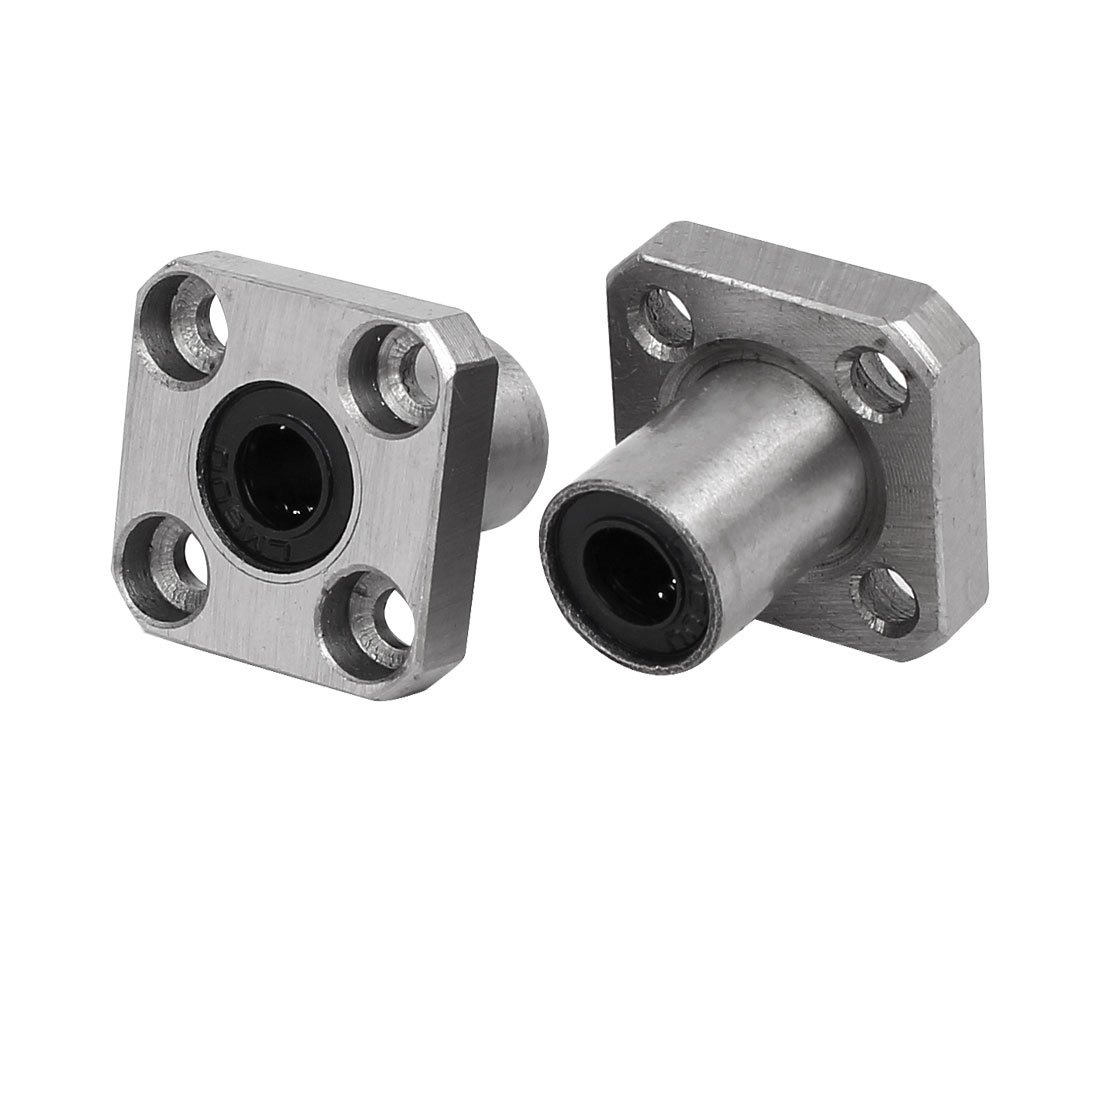 sourcingmap® 6mm Inner Dia Carbon Steel Square Base Flange Linear Bearing LMK-LUU6 2pcs a17032200ux0003